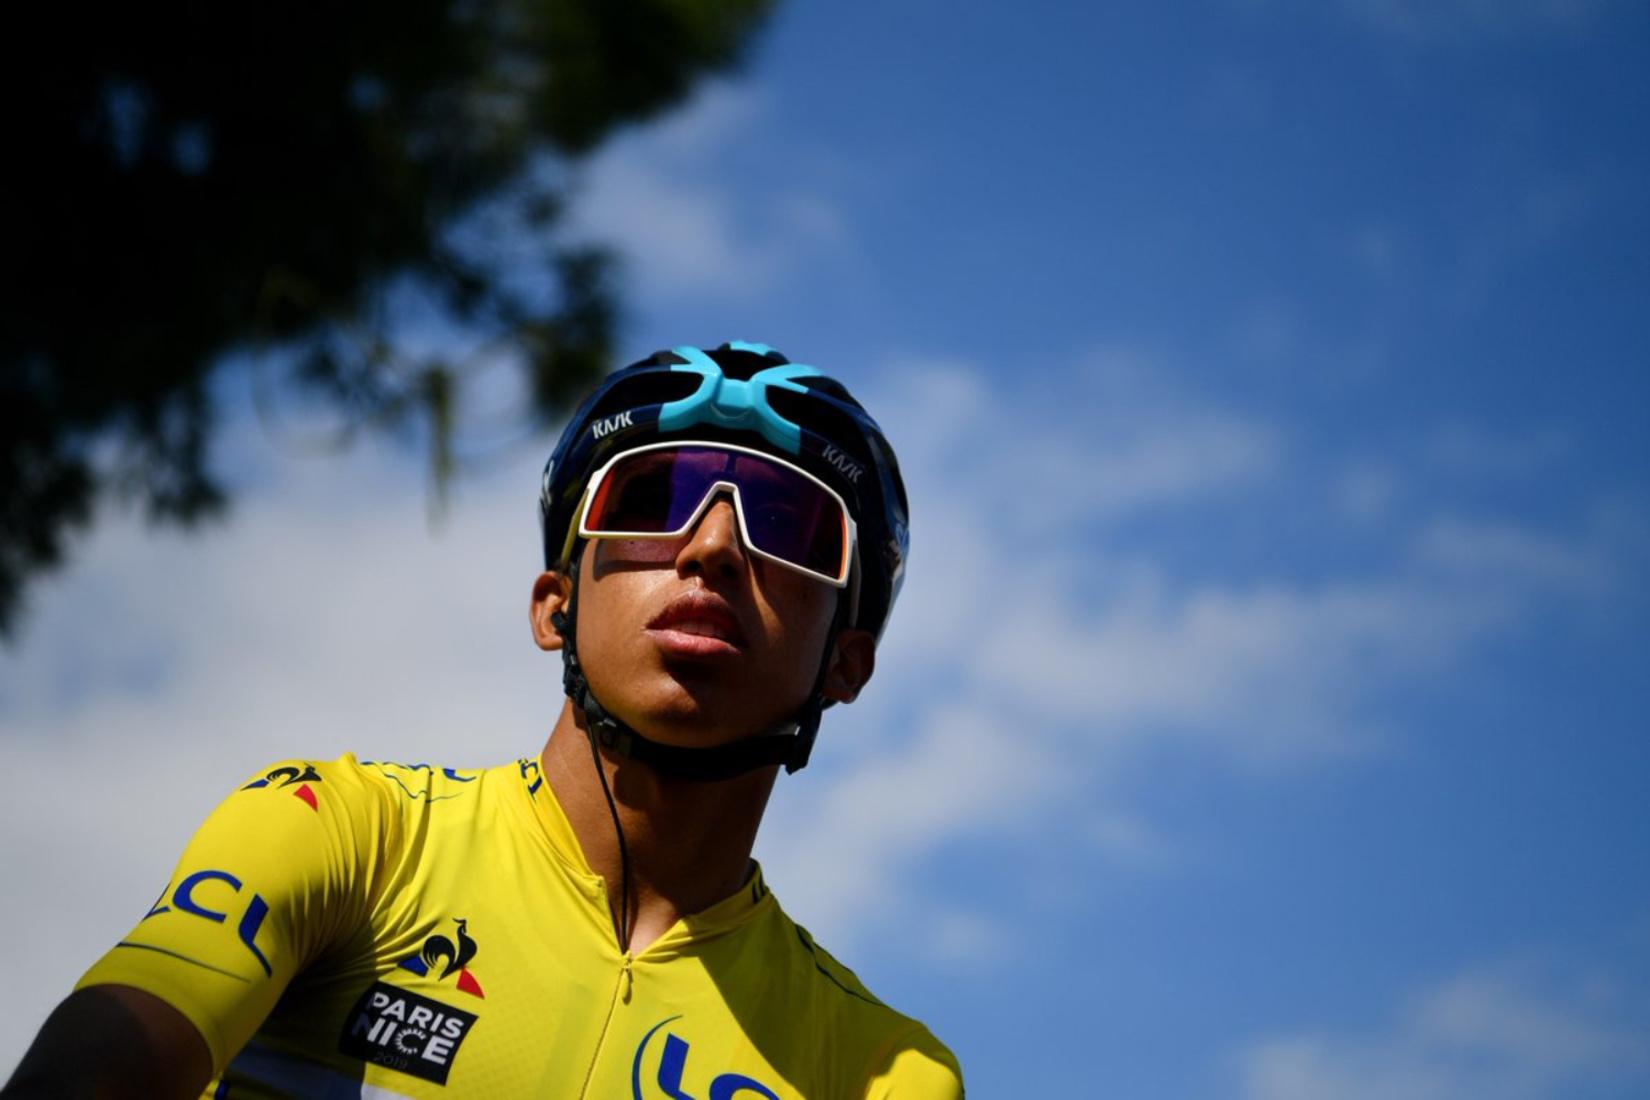 Colombia al frente del Tour de Francia